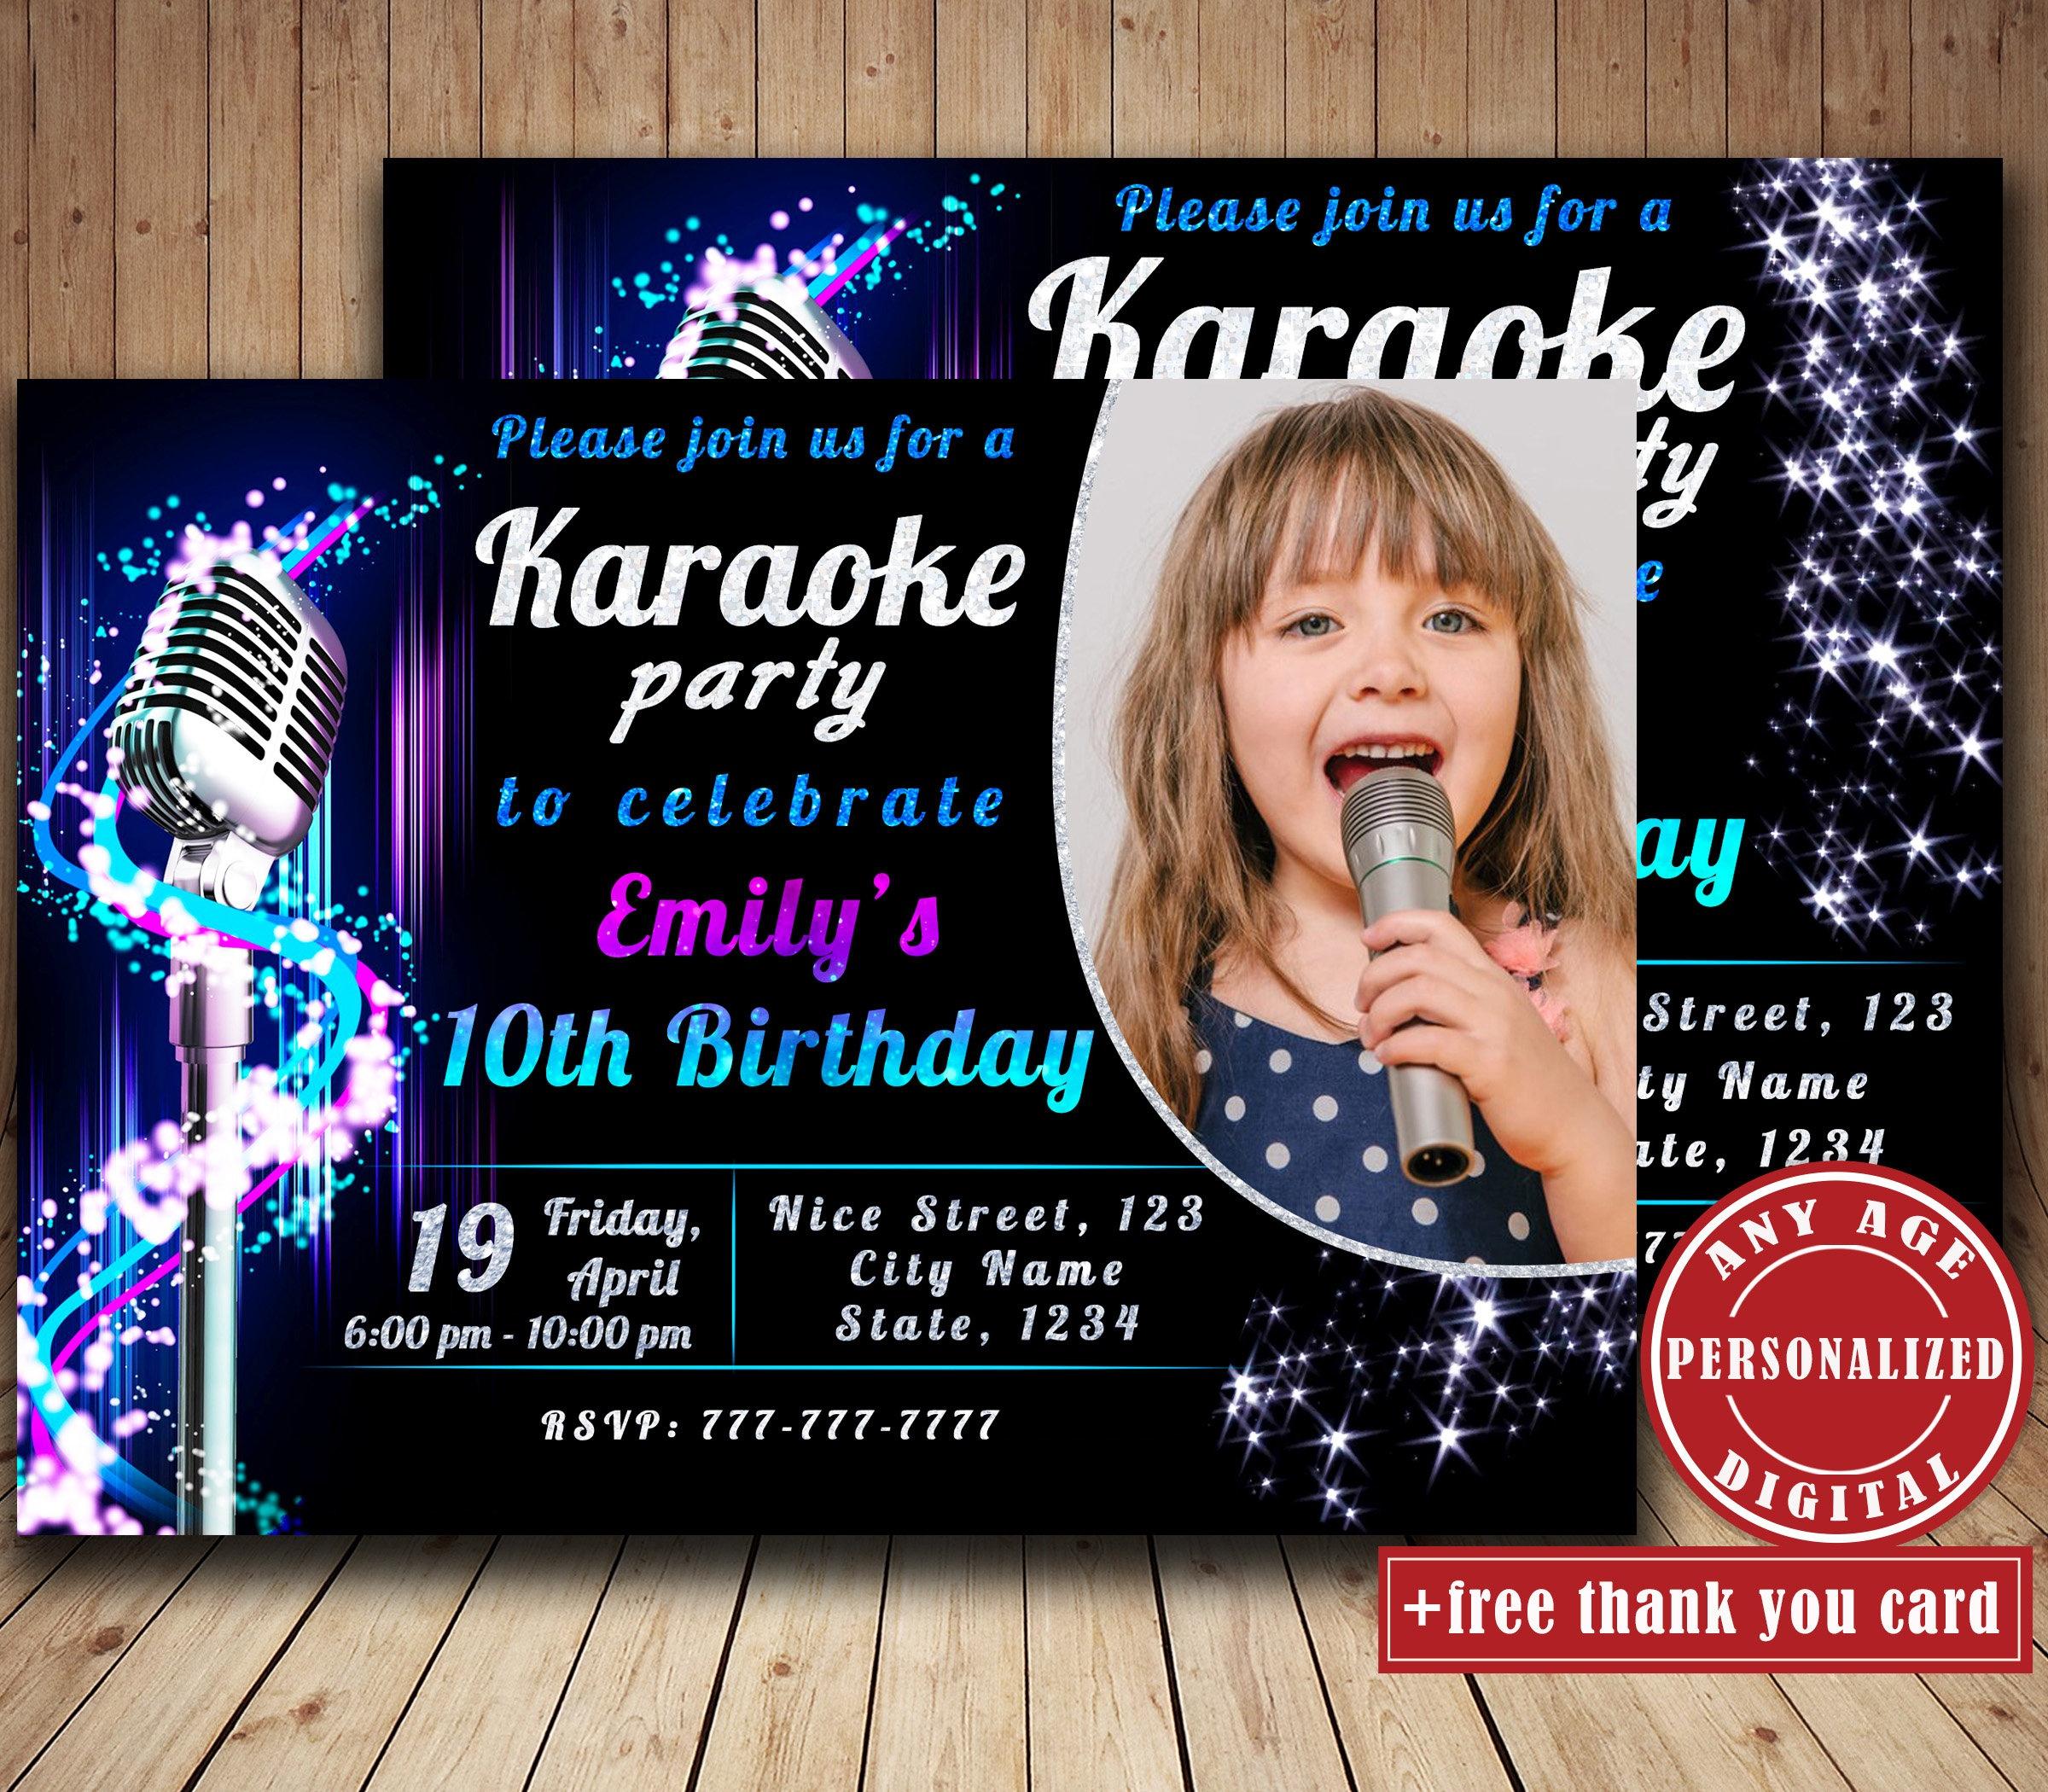 Karaoke Birthday Party Invitation With Photo Singing Party | Etsy - Free Printable Karaoke Party Invitations